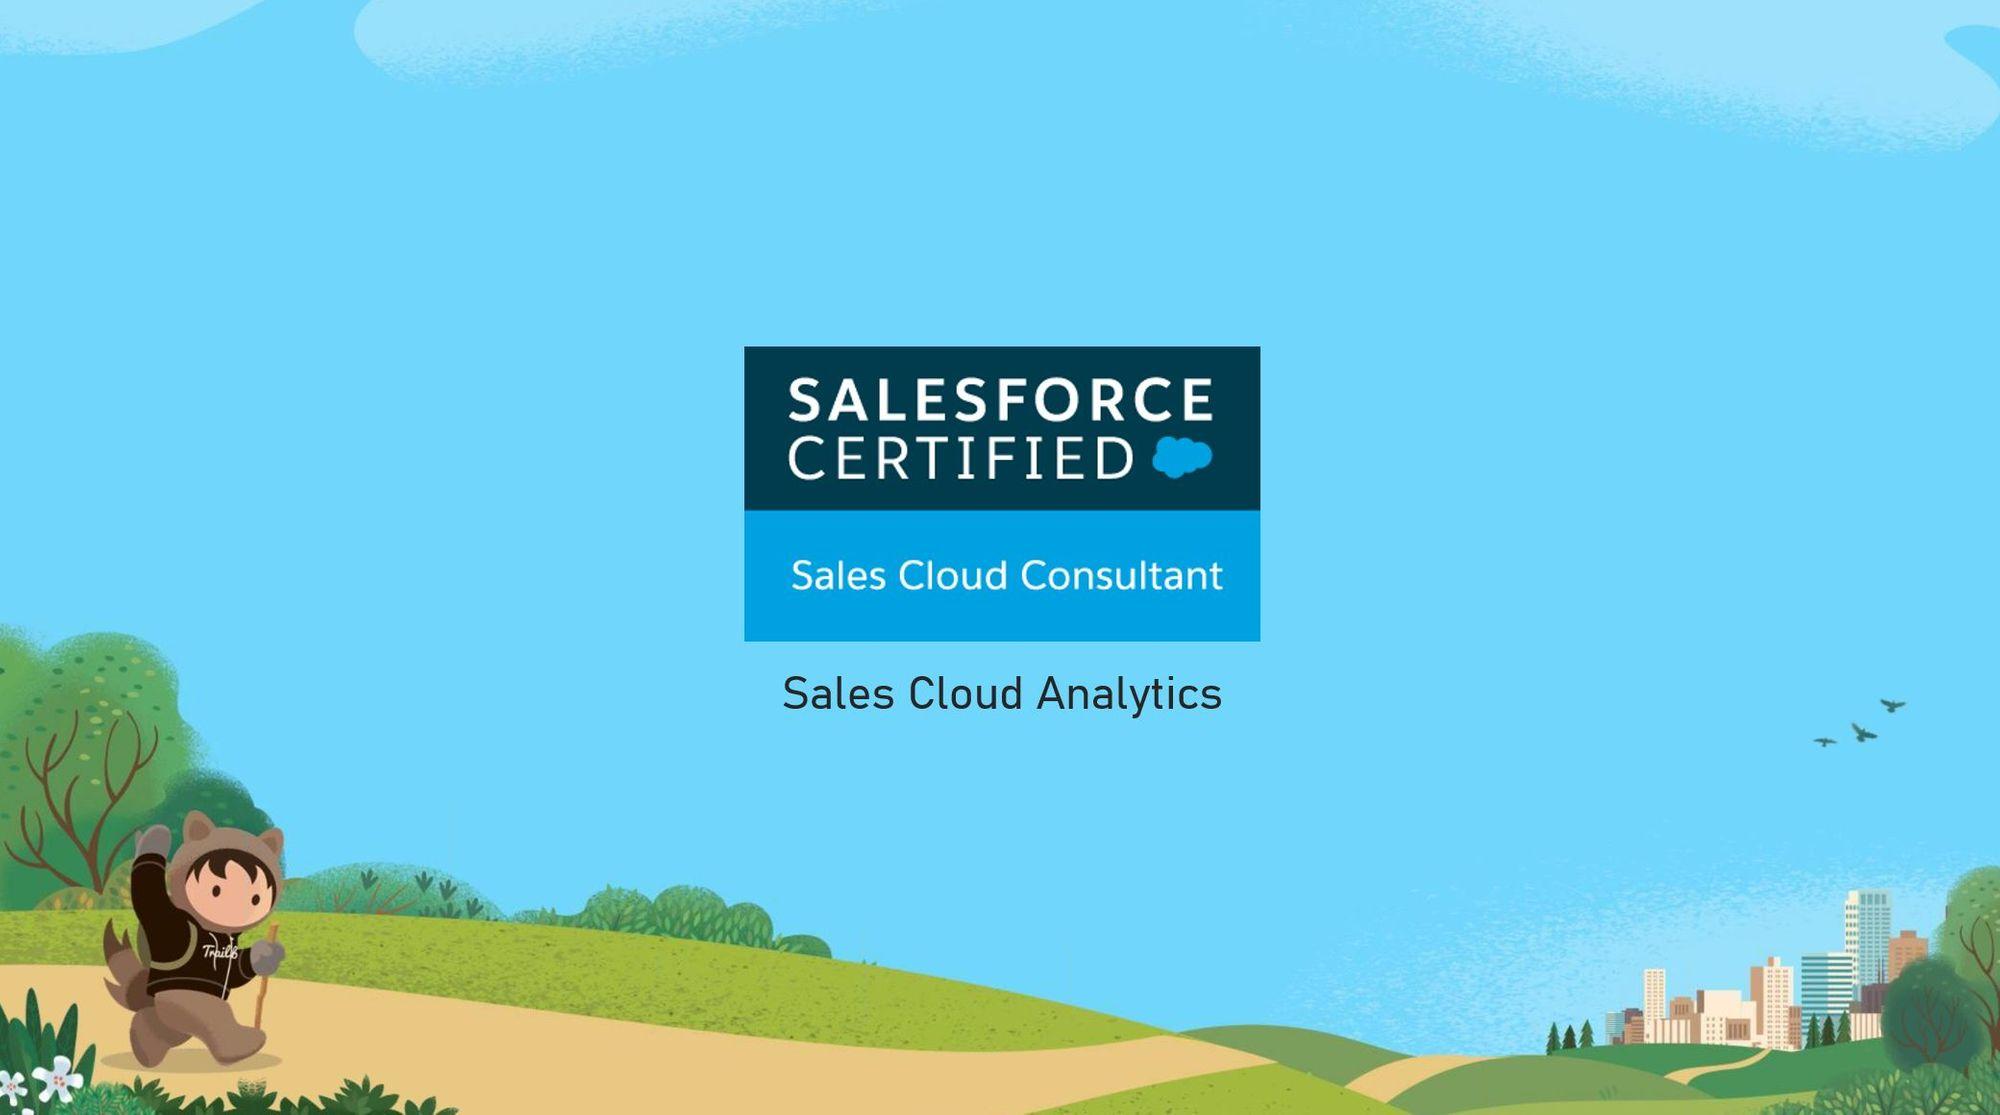 Salesforce Sales Cloud Consultant Exam Preparation: Sales Cloud Analytics